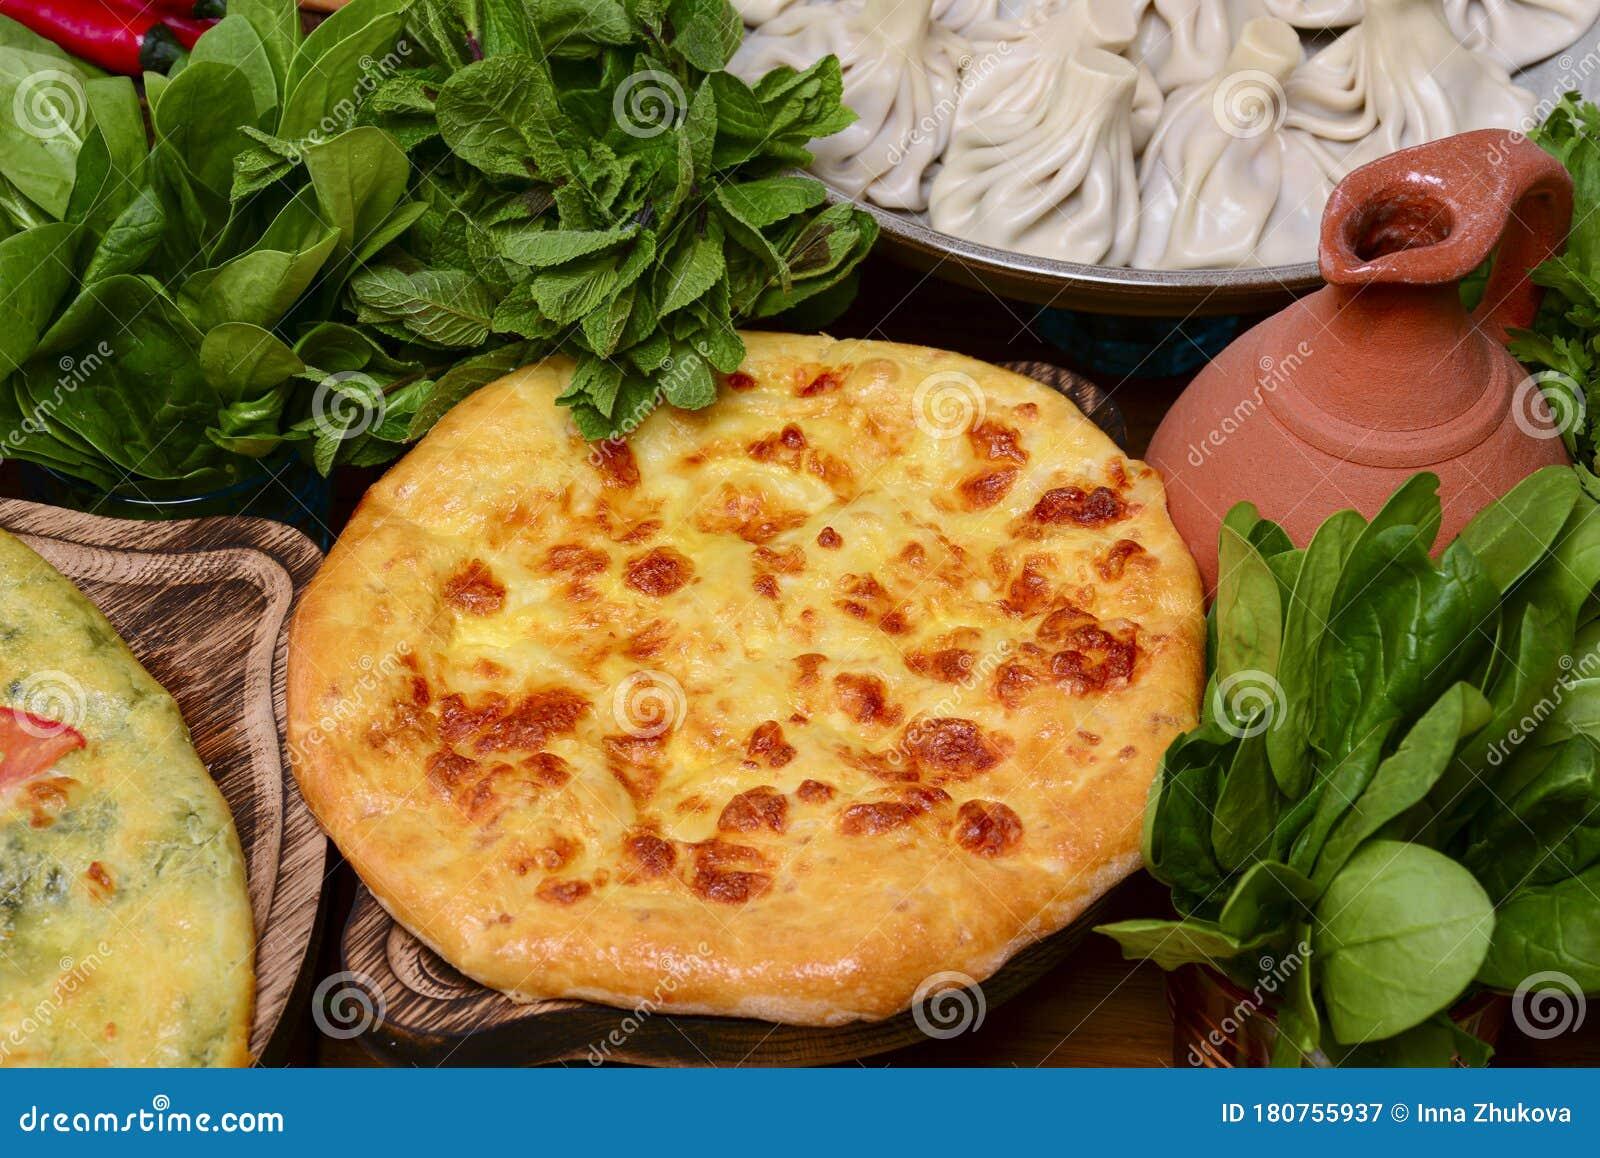 Traditional Georgian Kolkh Khachapuri With Suluguni And Brynza Cheese On The Table Khachapuri Megruli Homemade Baking Stock Image Image Of Lunch Bakery 180755937